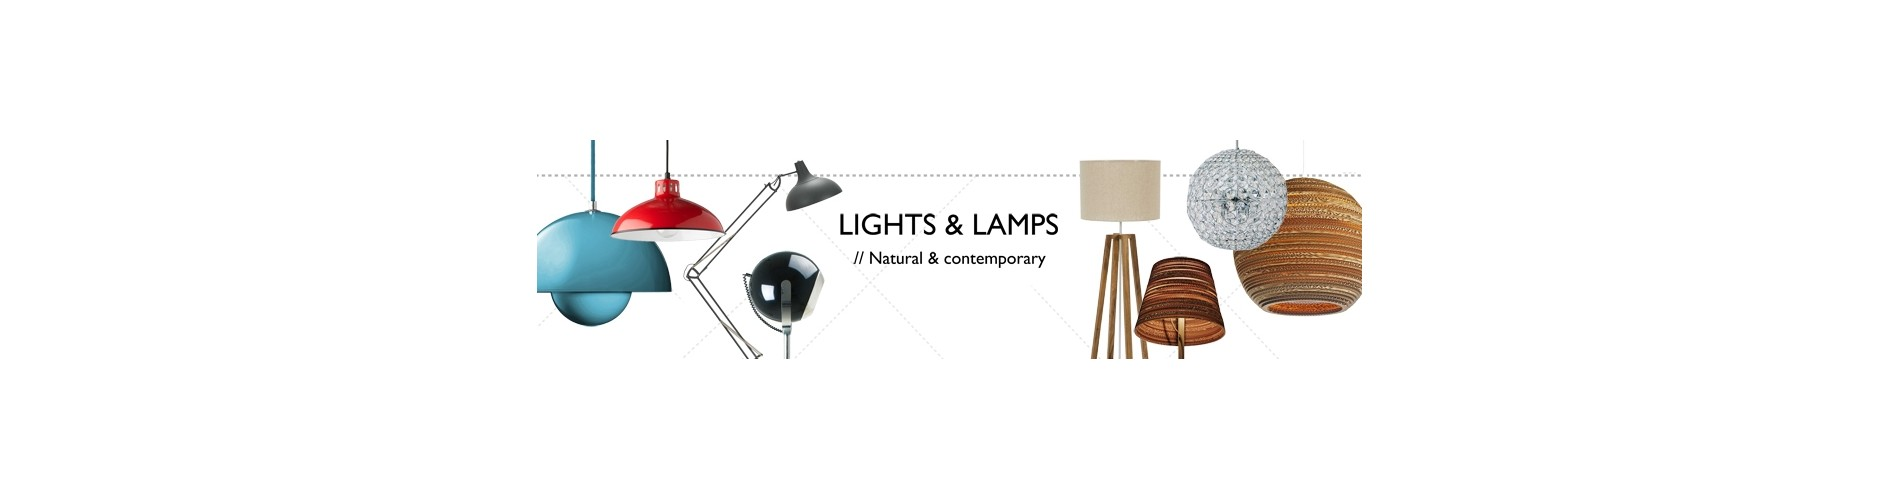 UK Modern Lighting | Pendant Table Wall & Floor Lamps & Lights